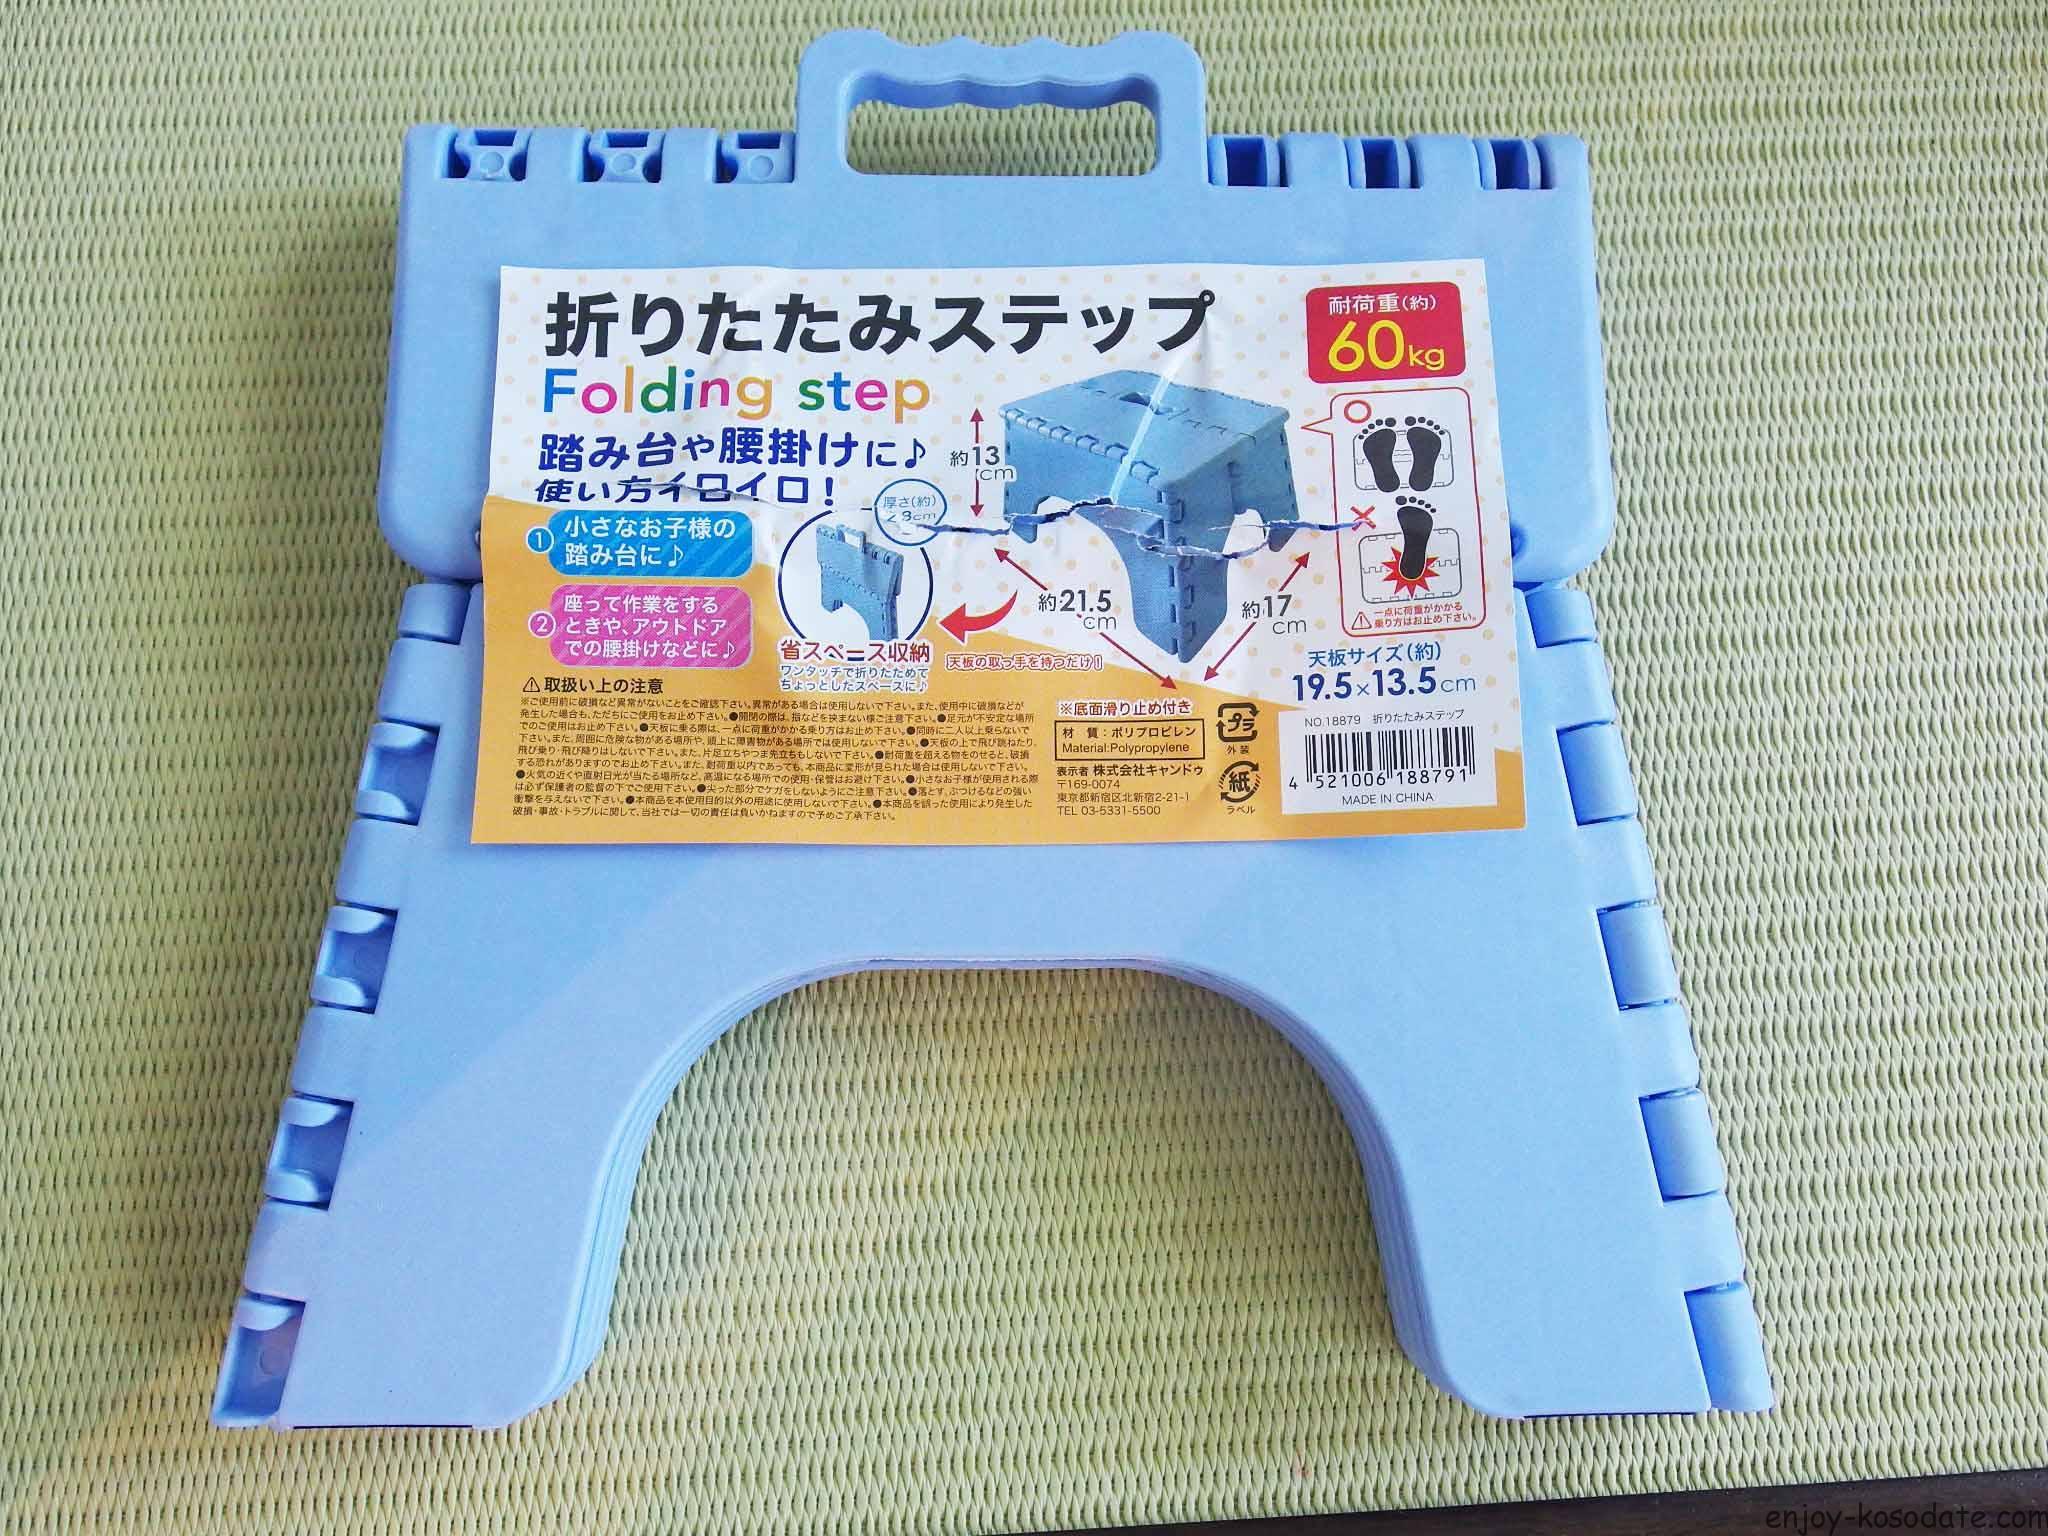 IMGP9950 - コピー